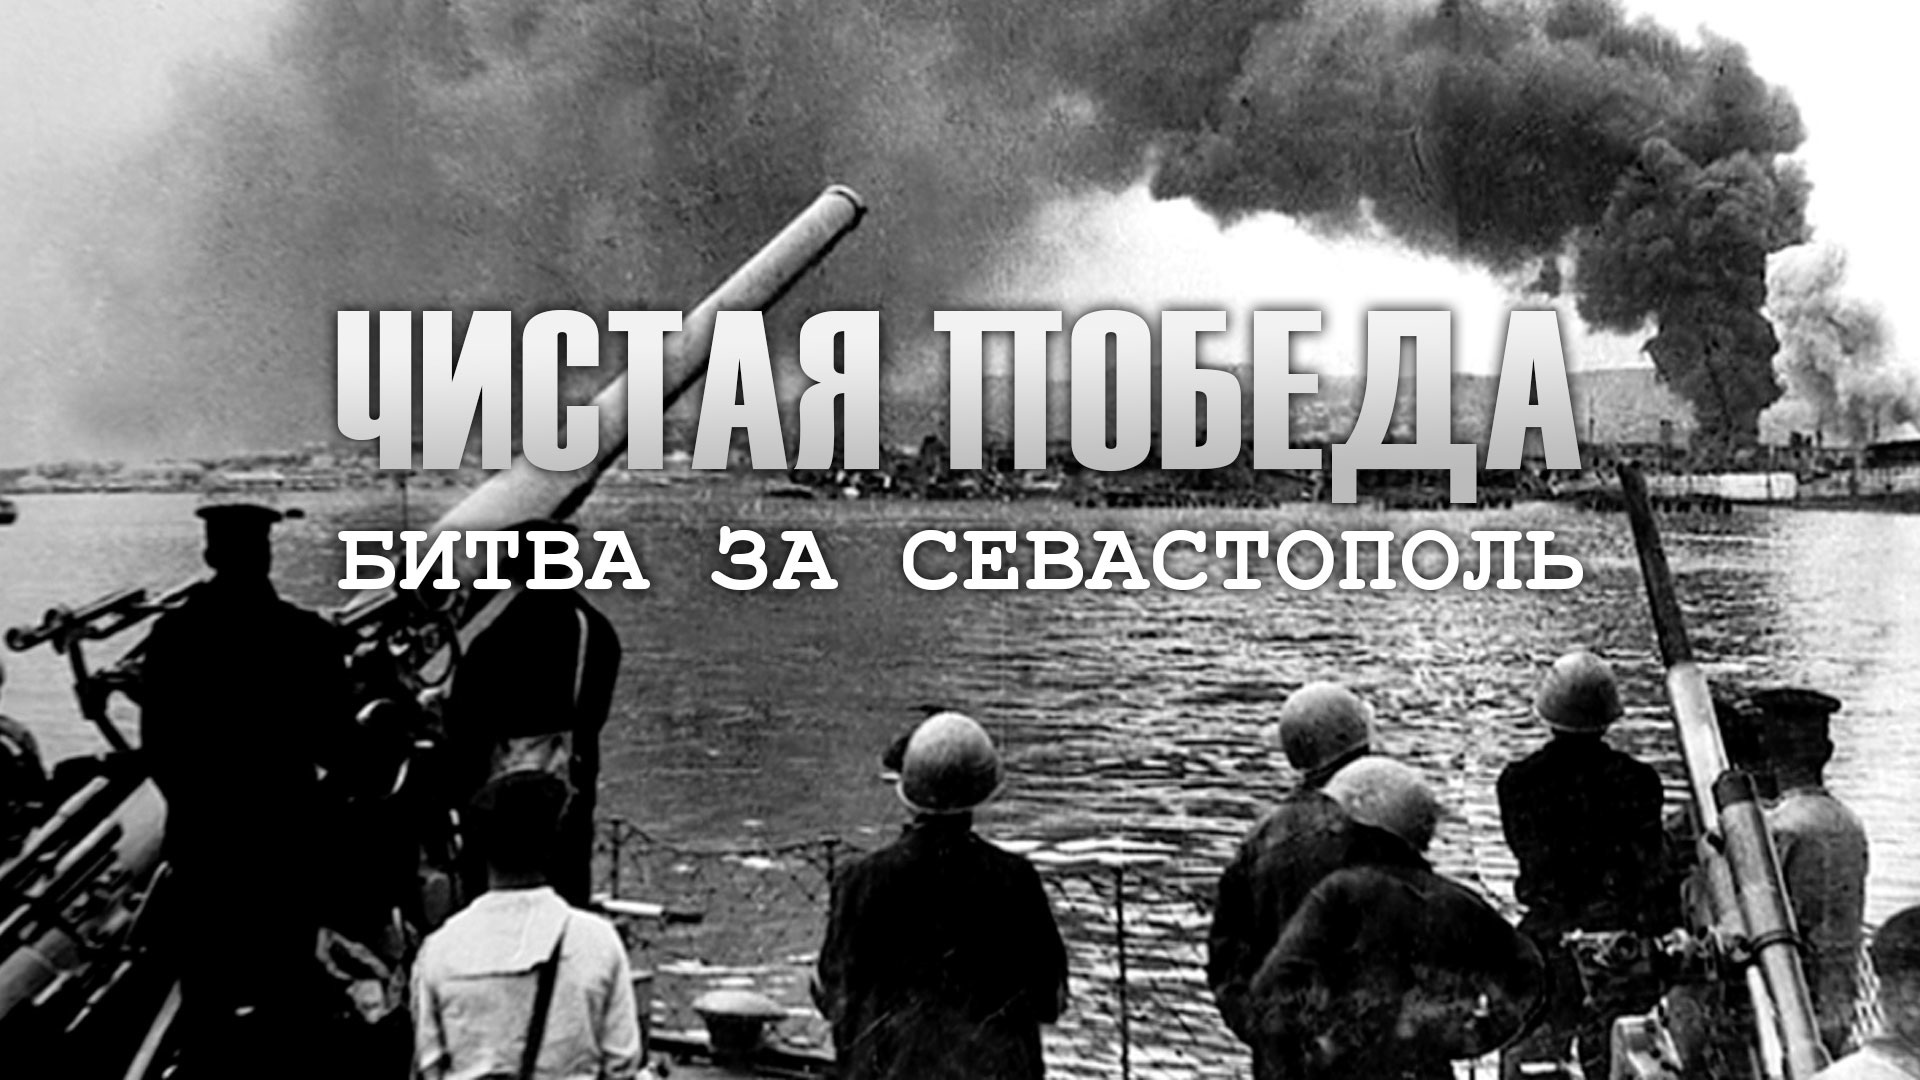 Чистая победа. Битва за Севастополь